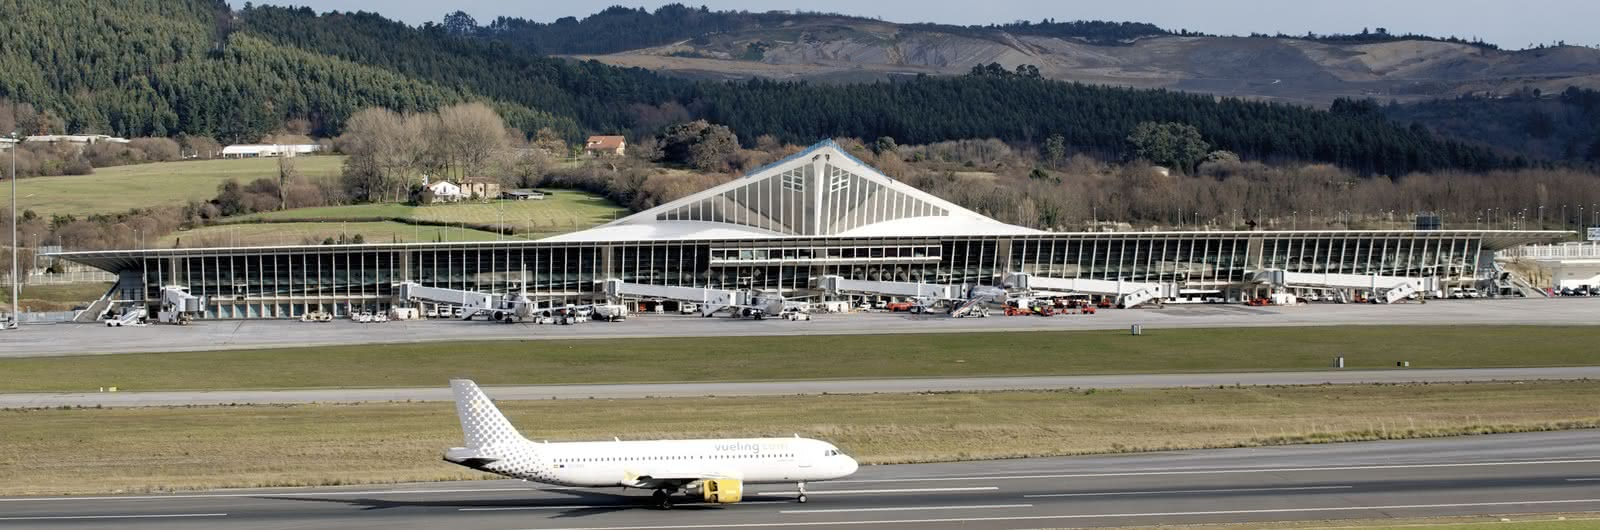 bilbao airport header